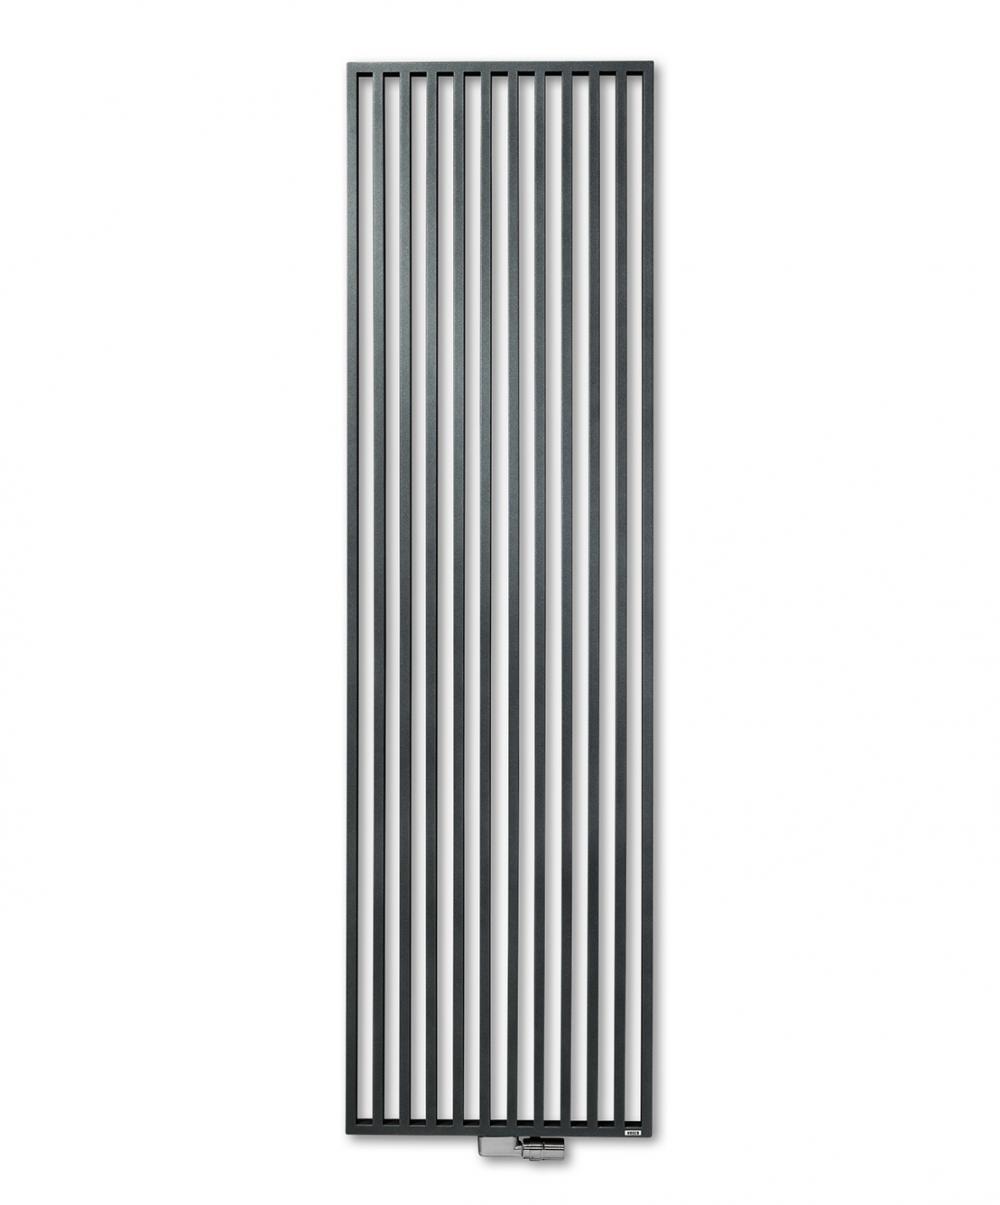 Calorifere verticale otel Vasco Arche VV 2200x470 mm, 1279 W